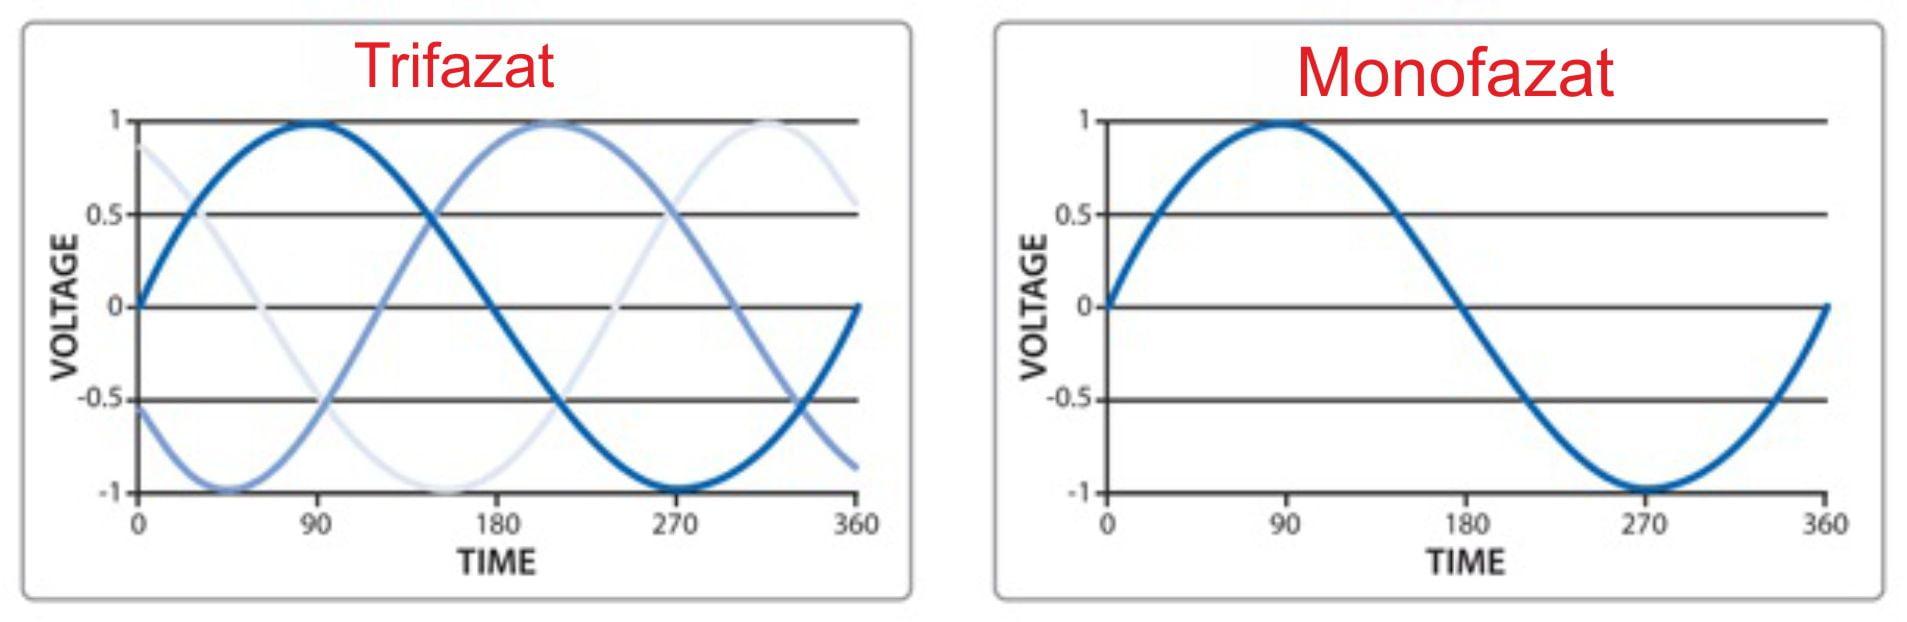 Proconsil Grup - proconsilgrup.ro - Diagrama faze monofazate vs trifazate